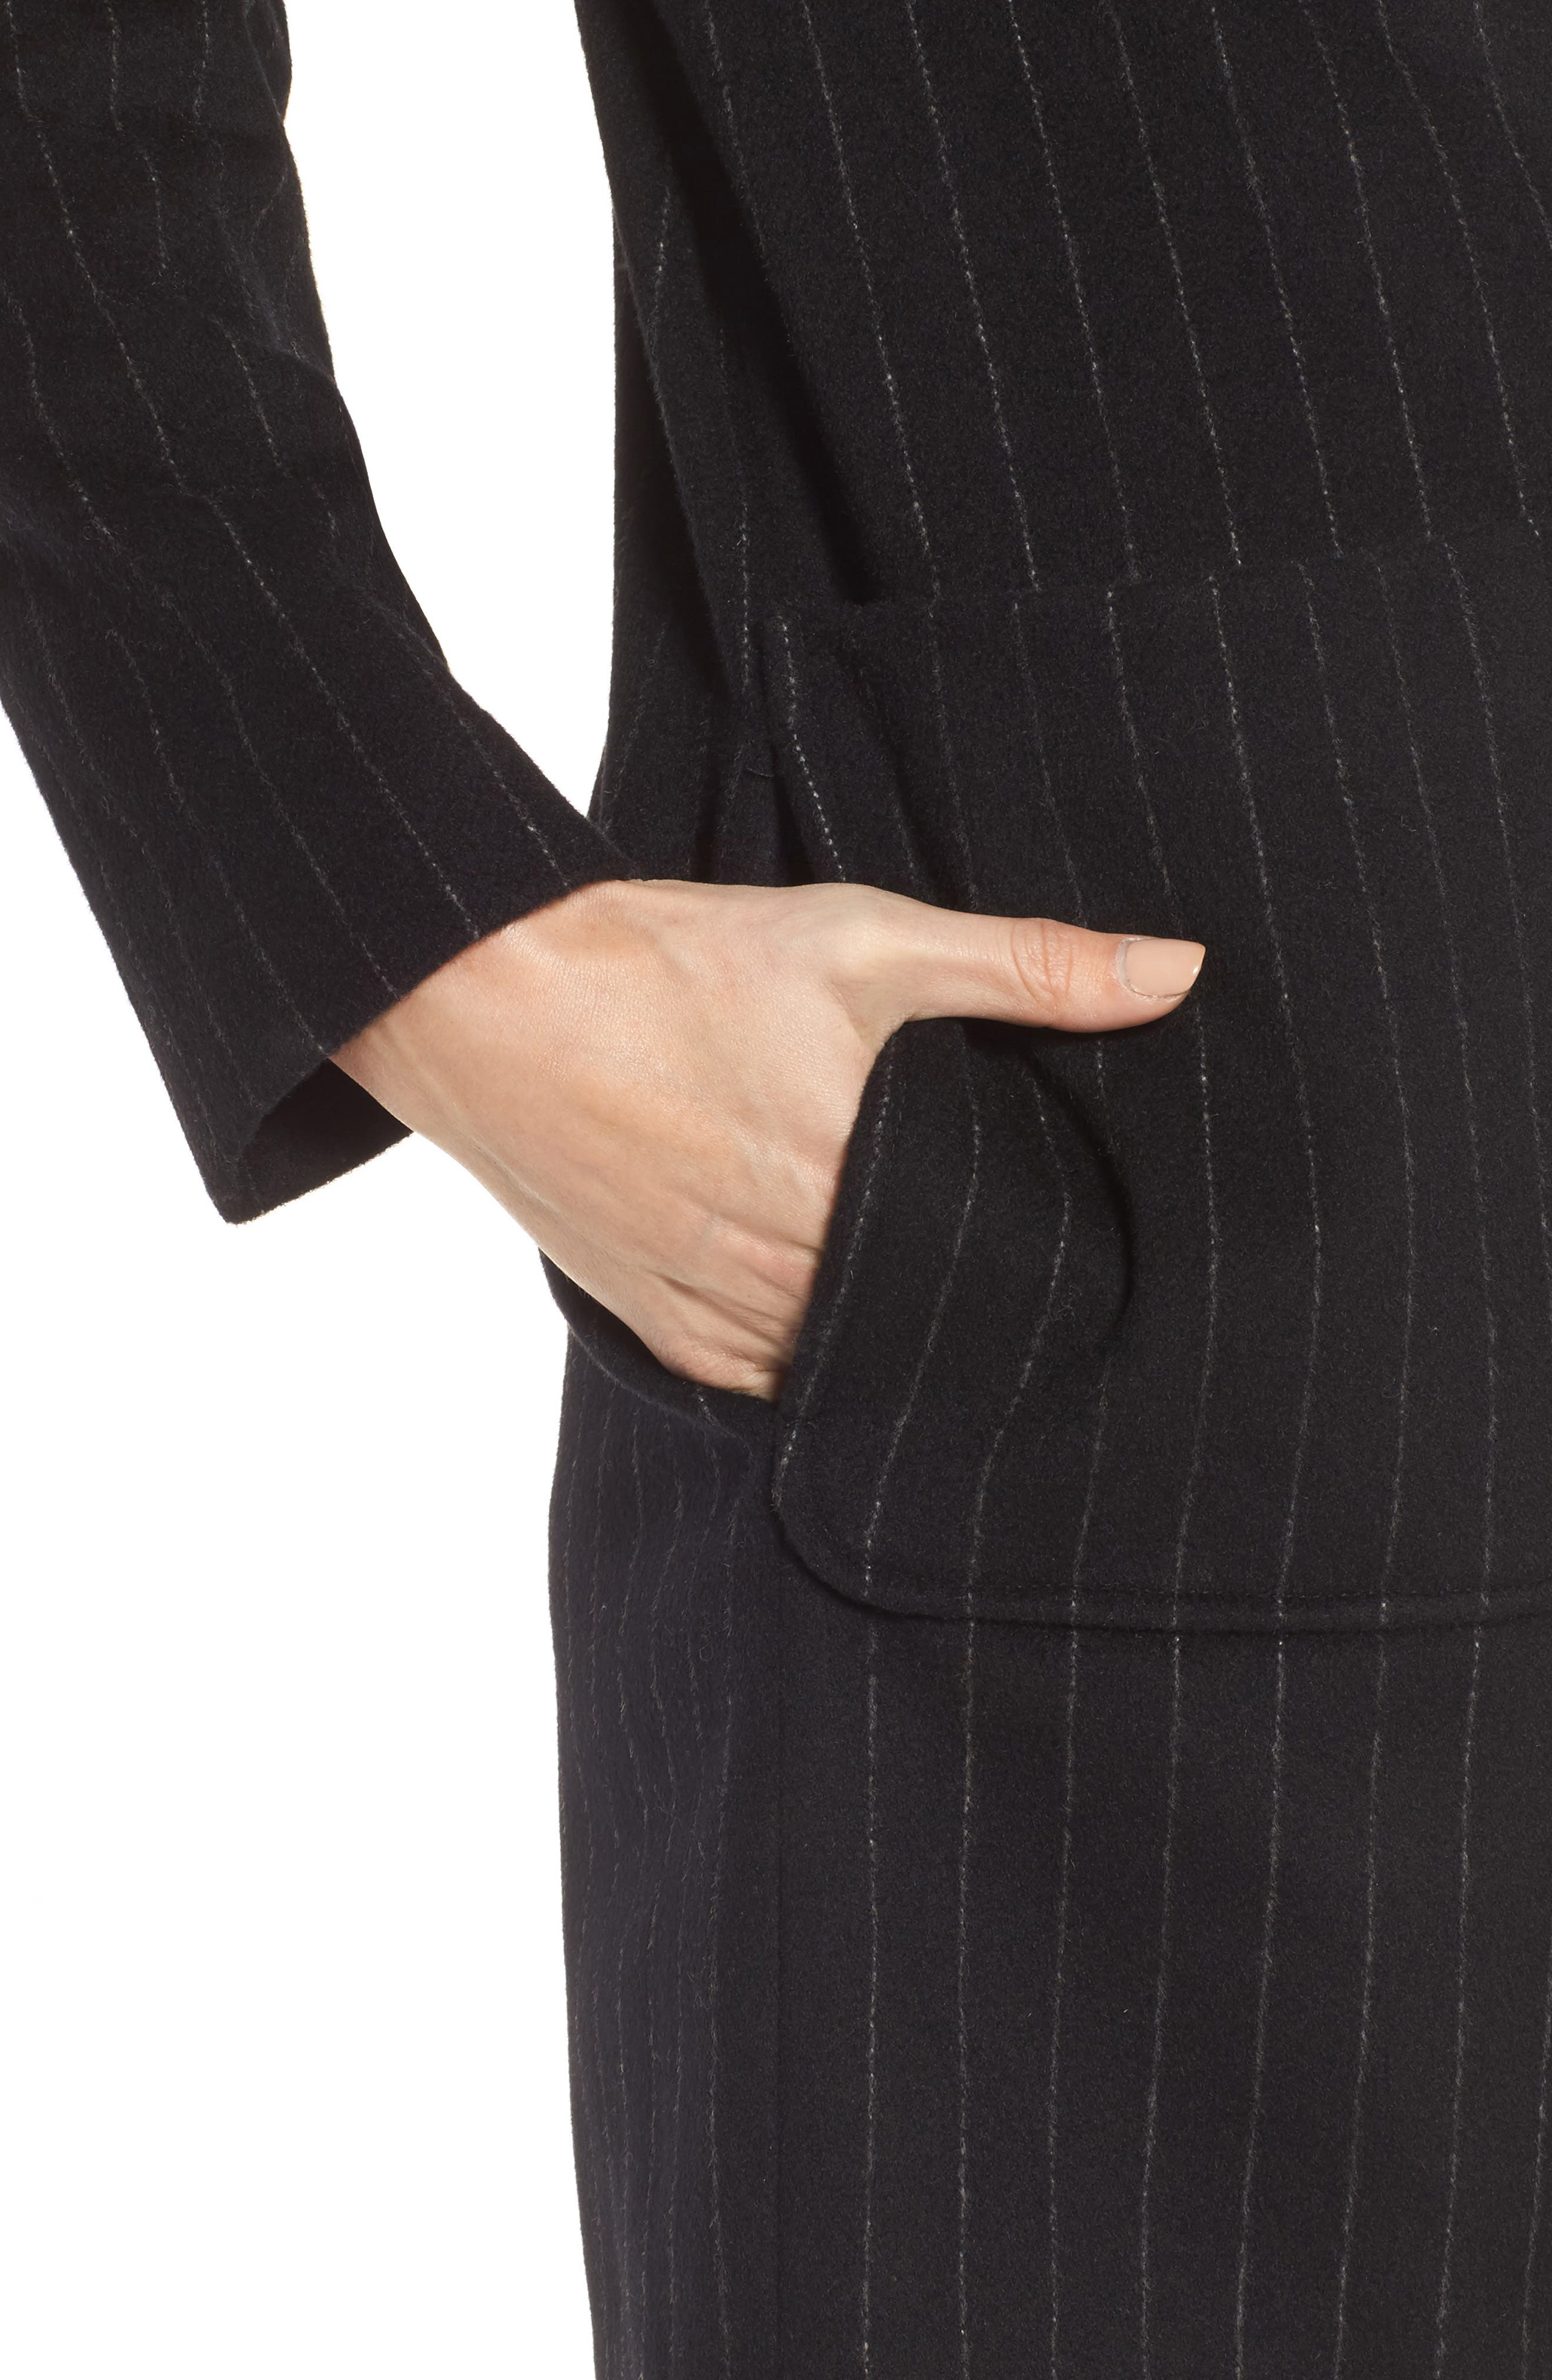 DKNY Pinstripe Wool Blend Coat,                             Alternate thumbnail 4, color,                             Black